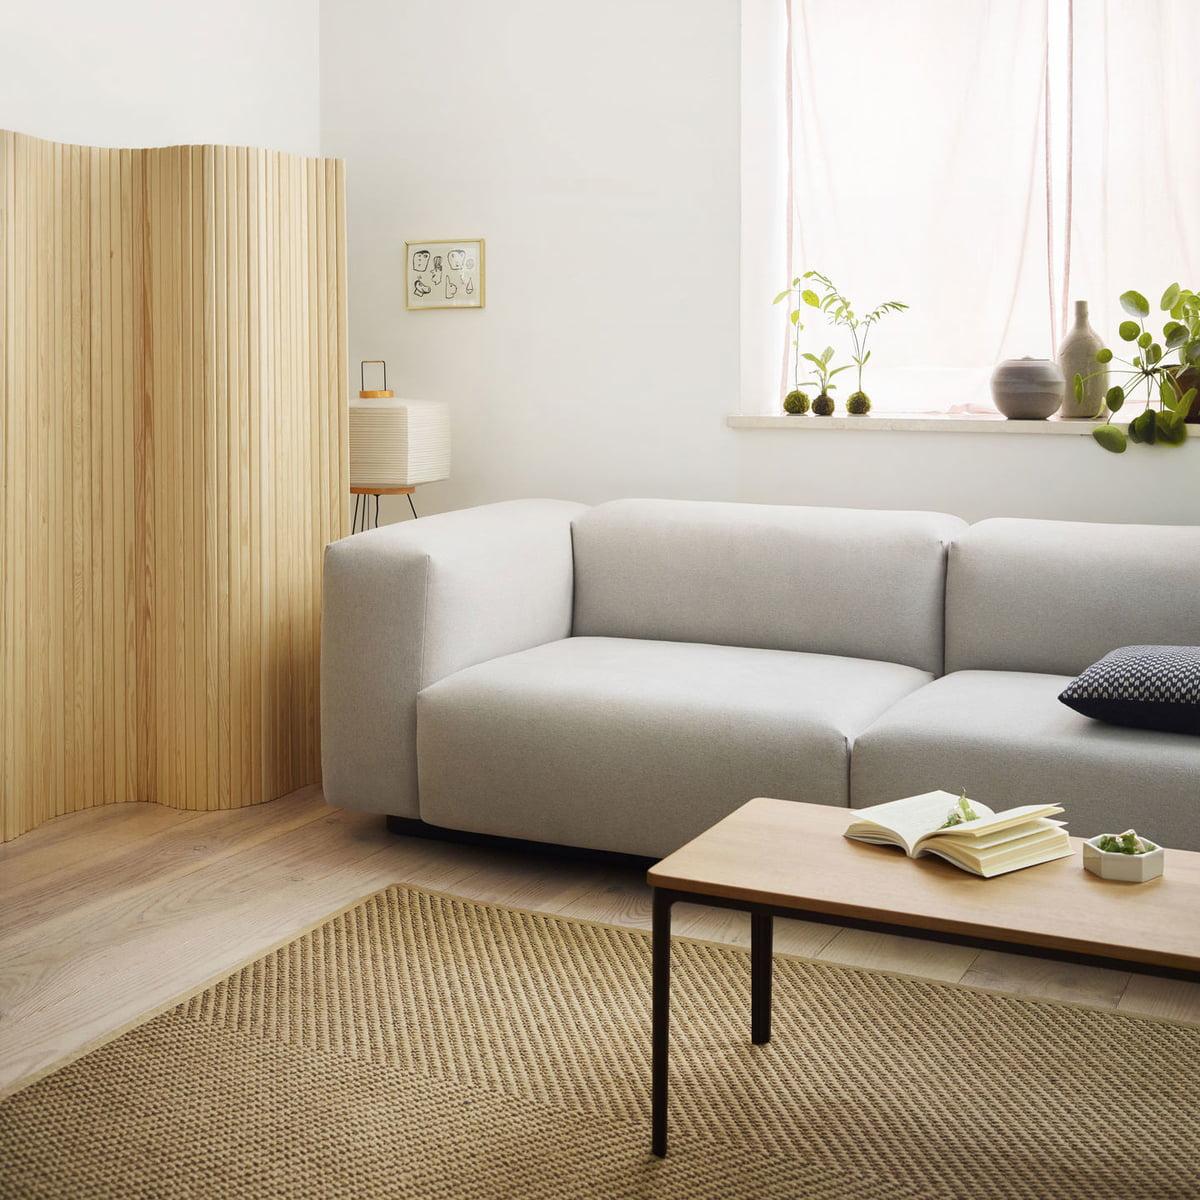 Soft Modular Sofa 3 Sitzer Von Vitra Connox